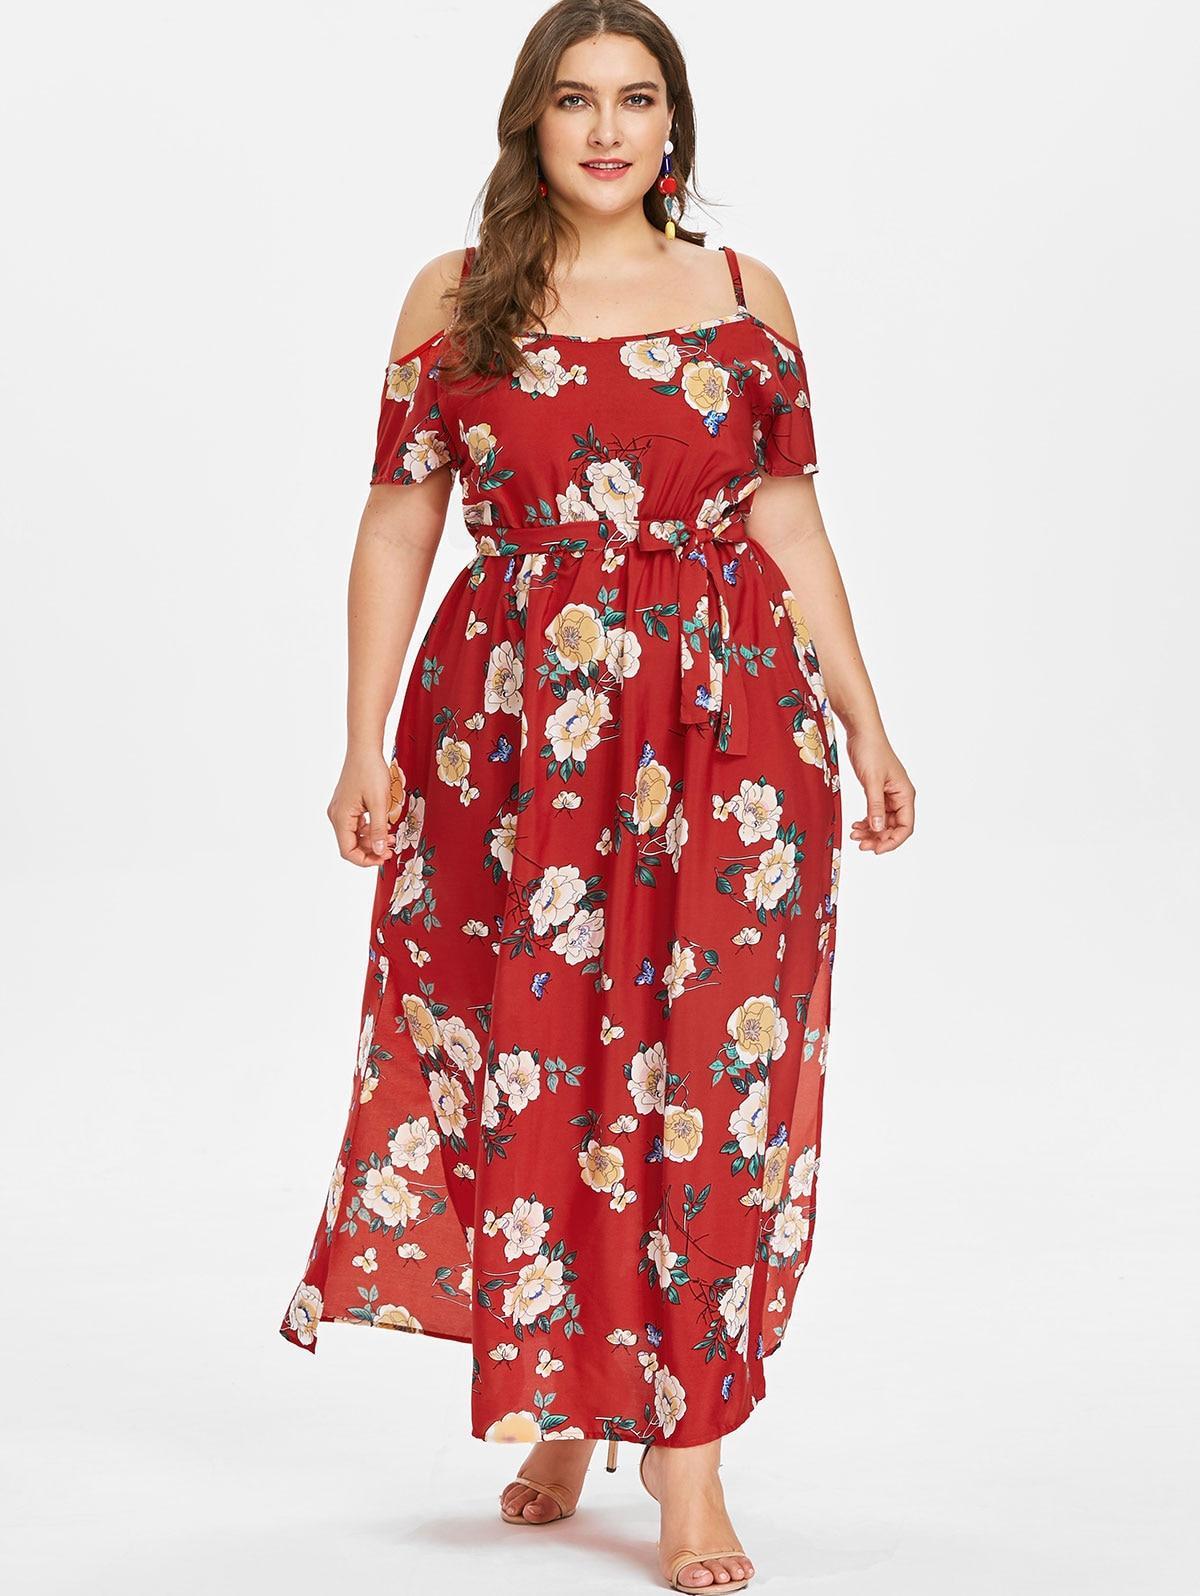 5f91d267b71c8 Wipalo Short Sleeve Dress Floral Print Beach Vintage Maxi Dresses Boho  Casual Cold Shoulder Belt Tunic Draped Plus Size Vestido